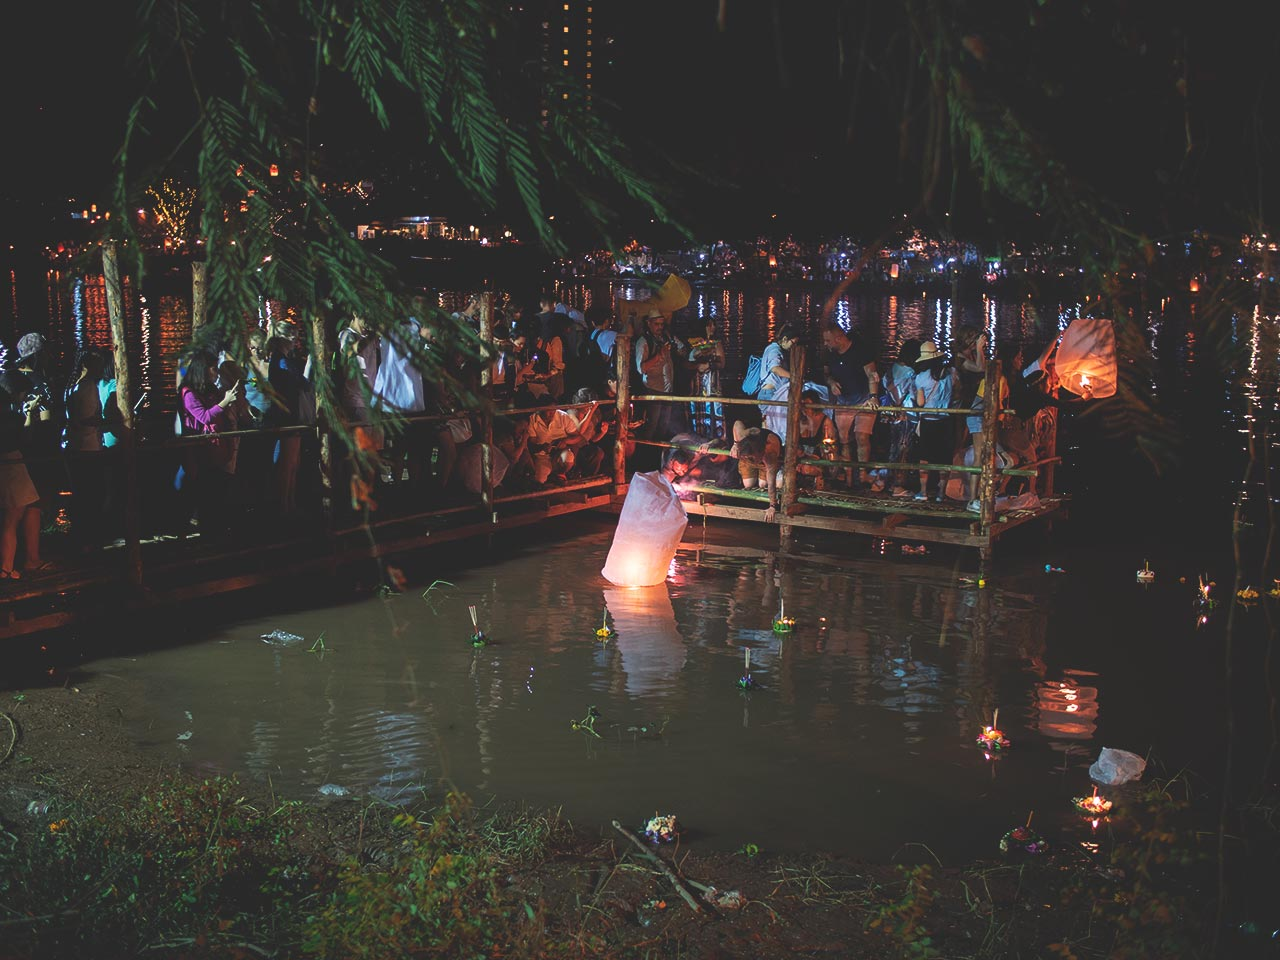 Loy Krathong Festival in Thailand - Krathong fällt in den Fluss